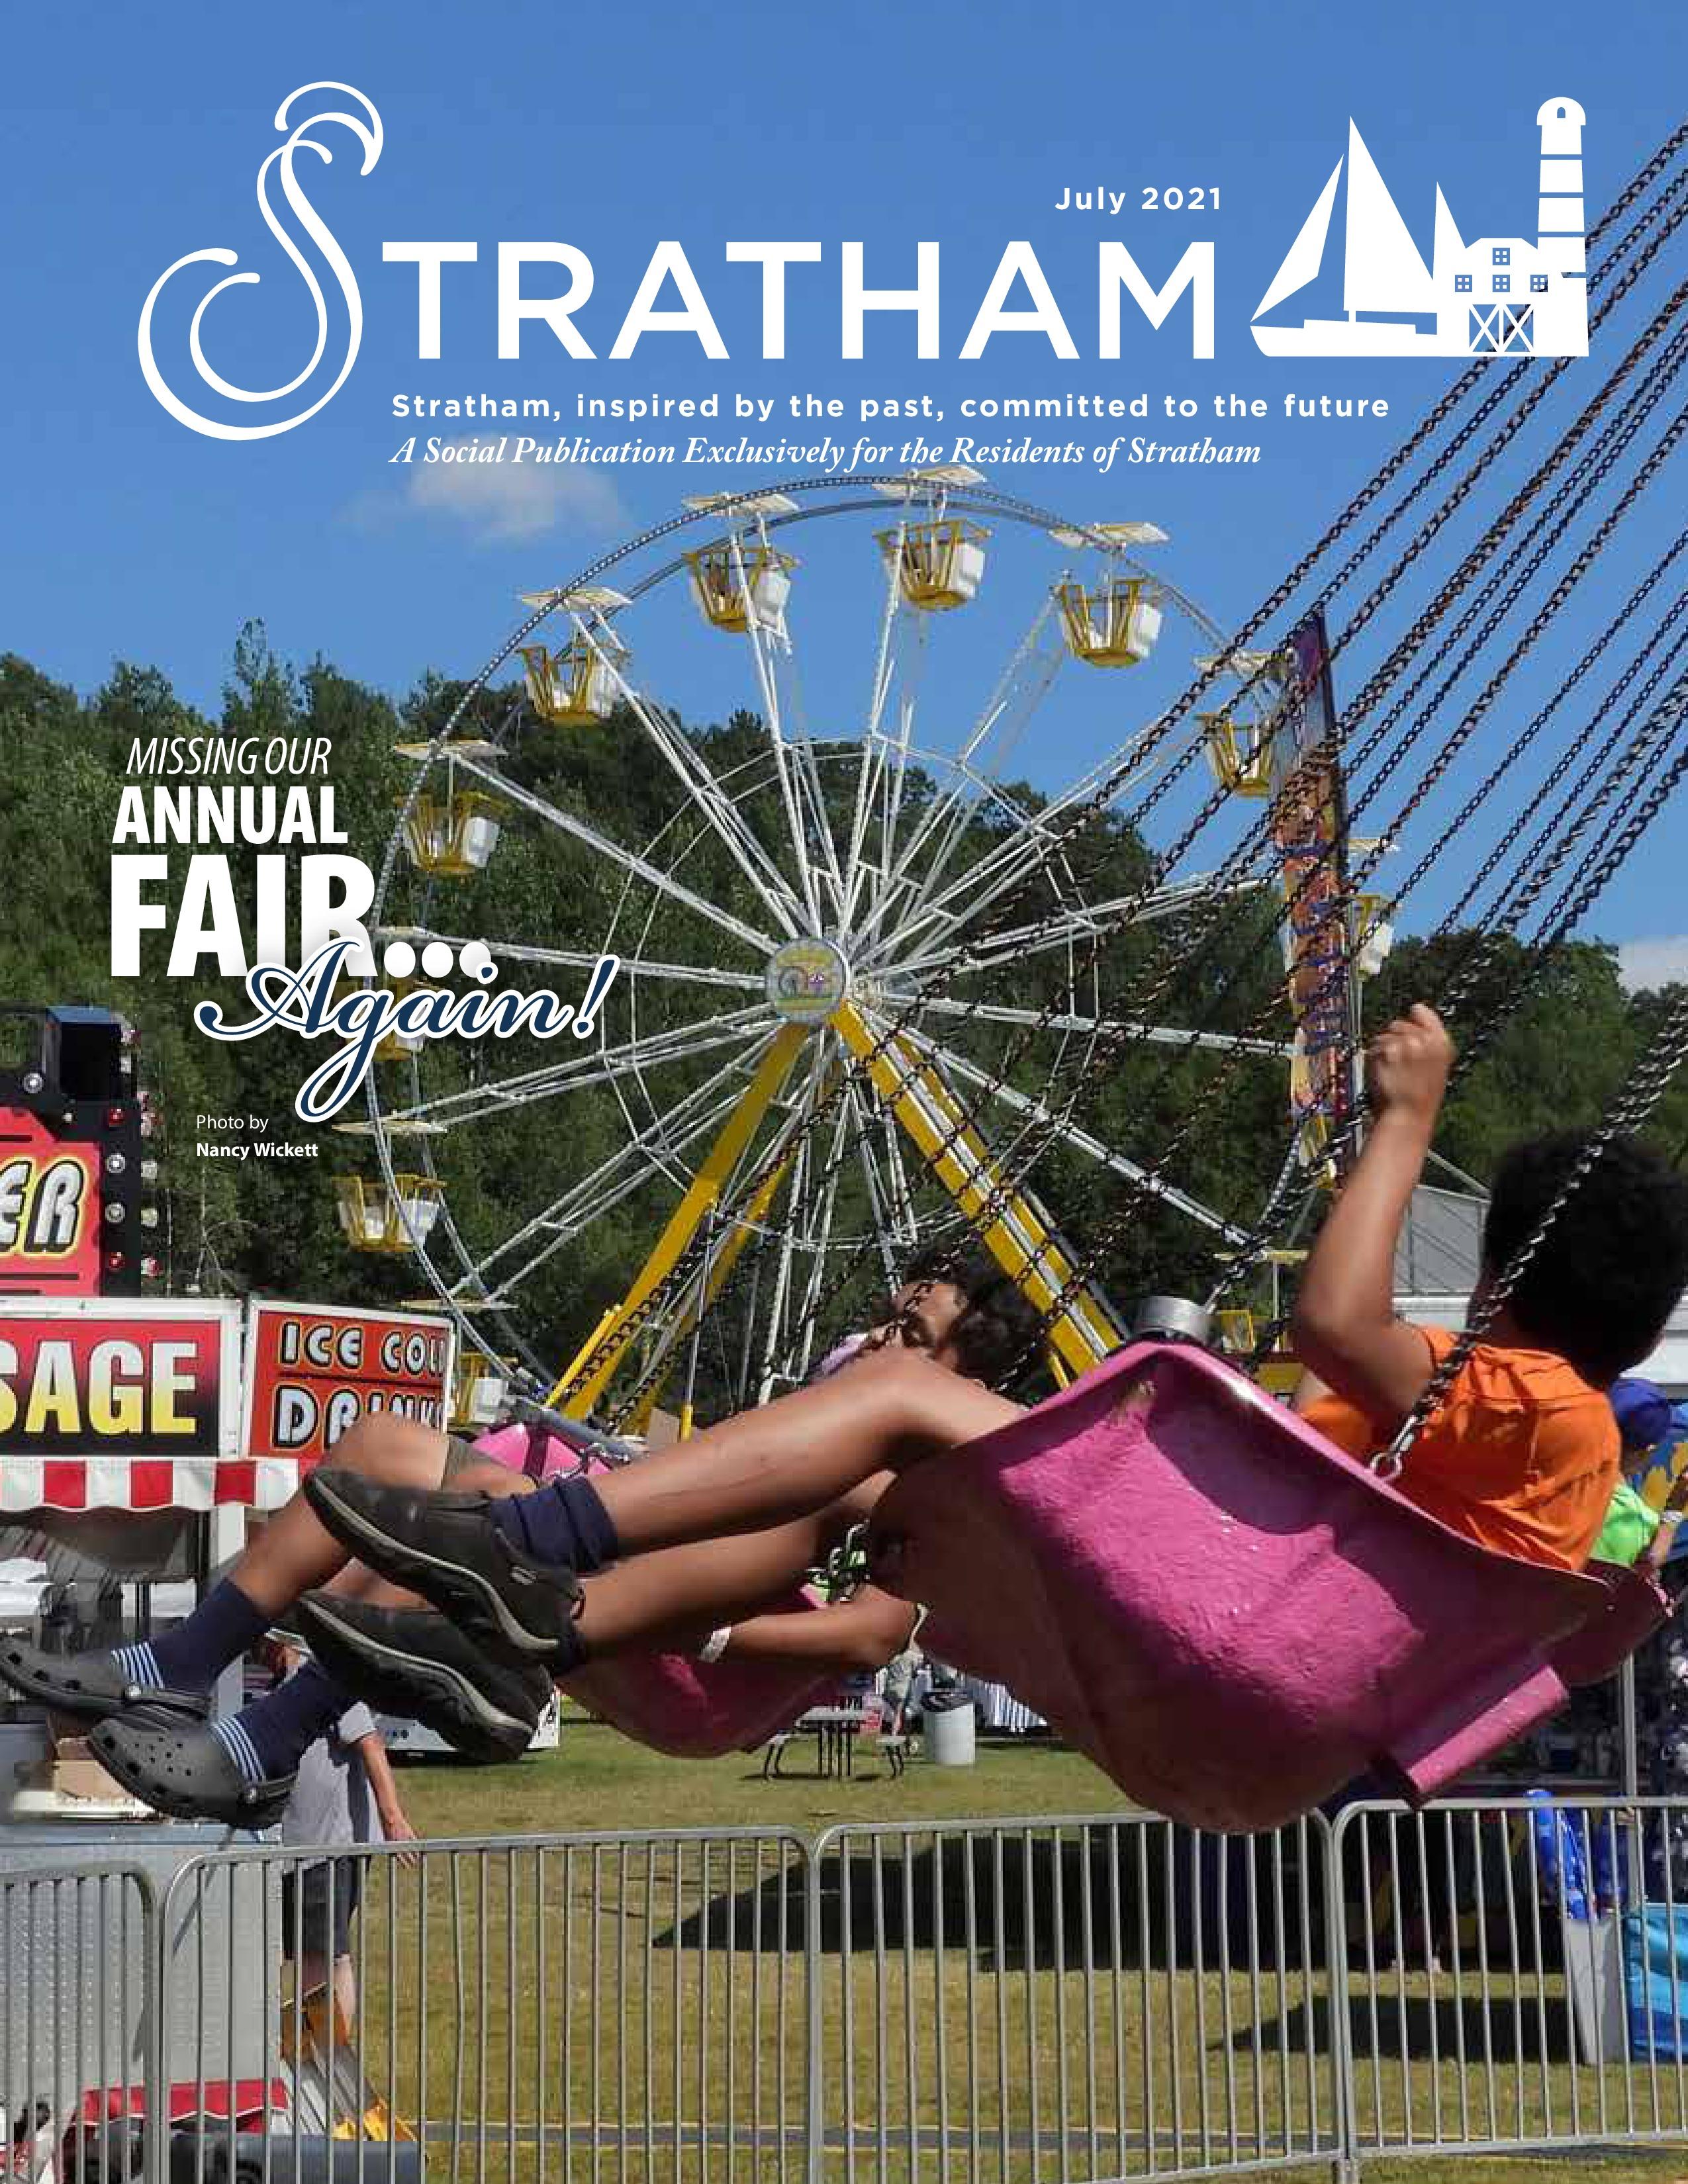 Stratham 2021-07-01